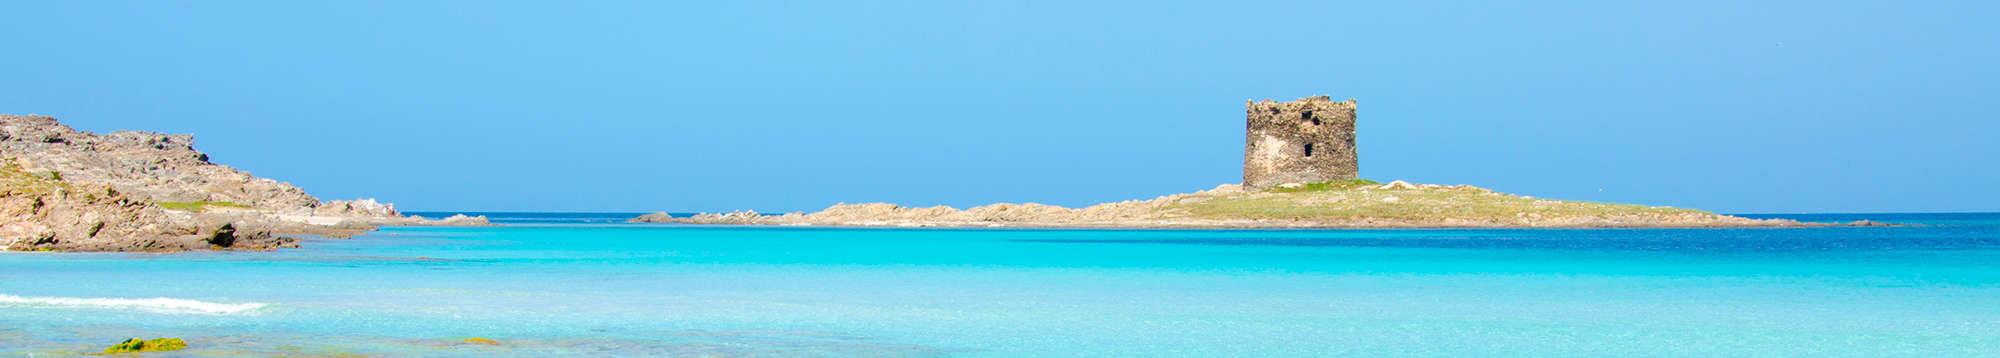 Week-end et séjour Sardaigne